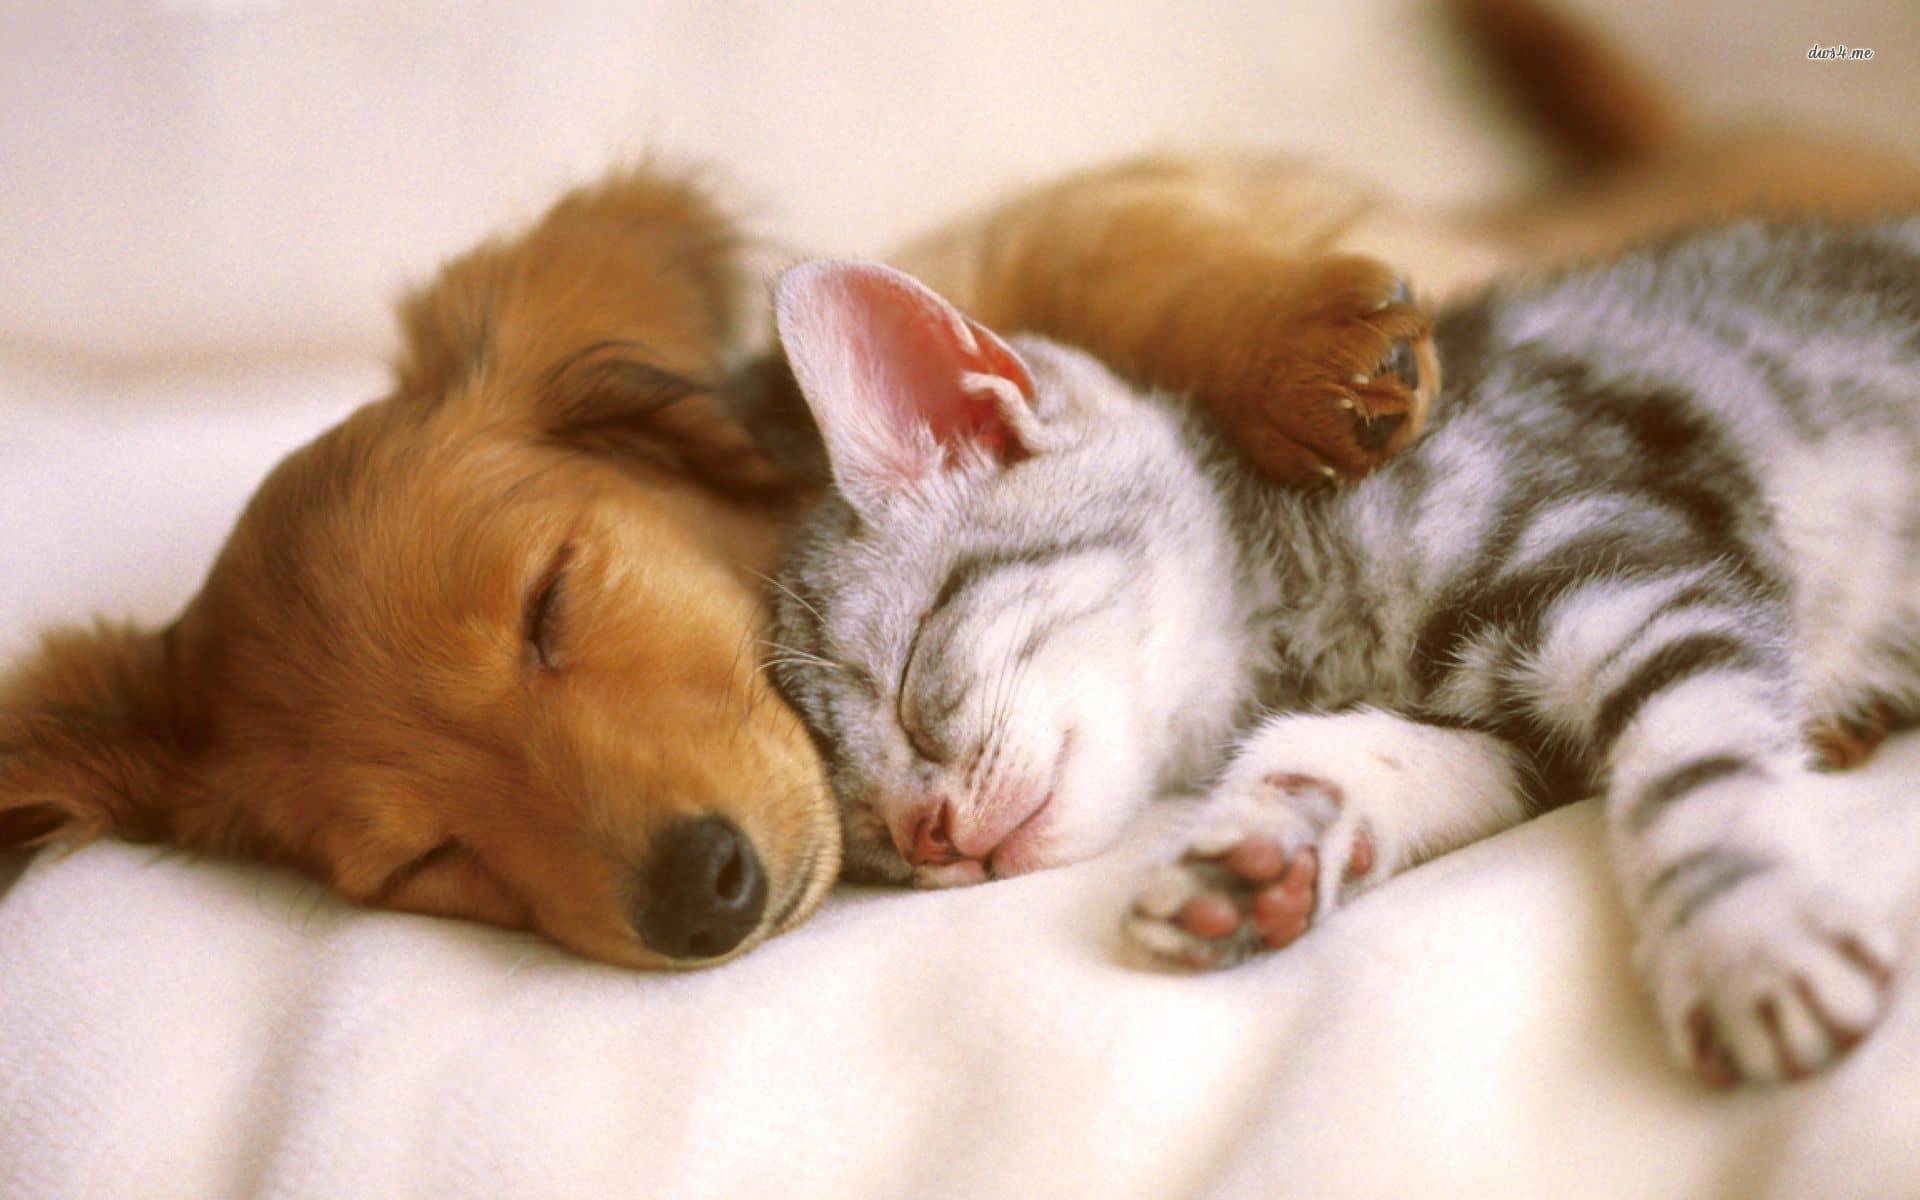 Cat & Dog Sleeping